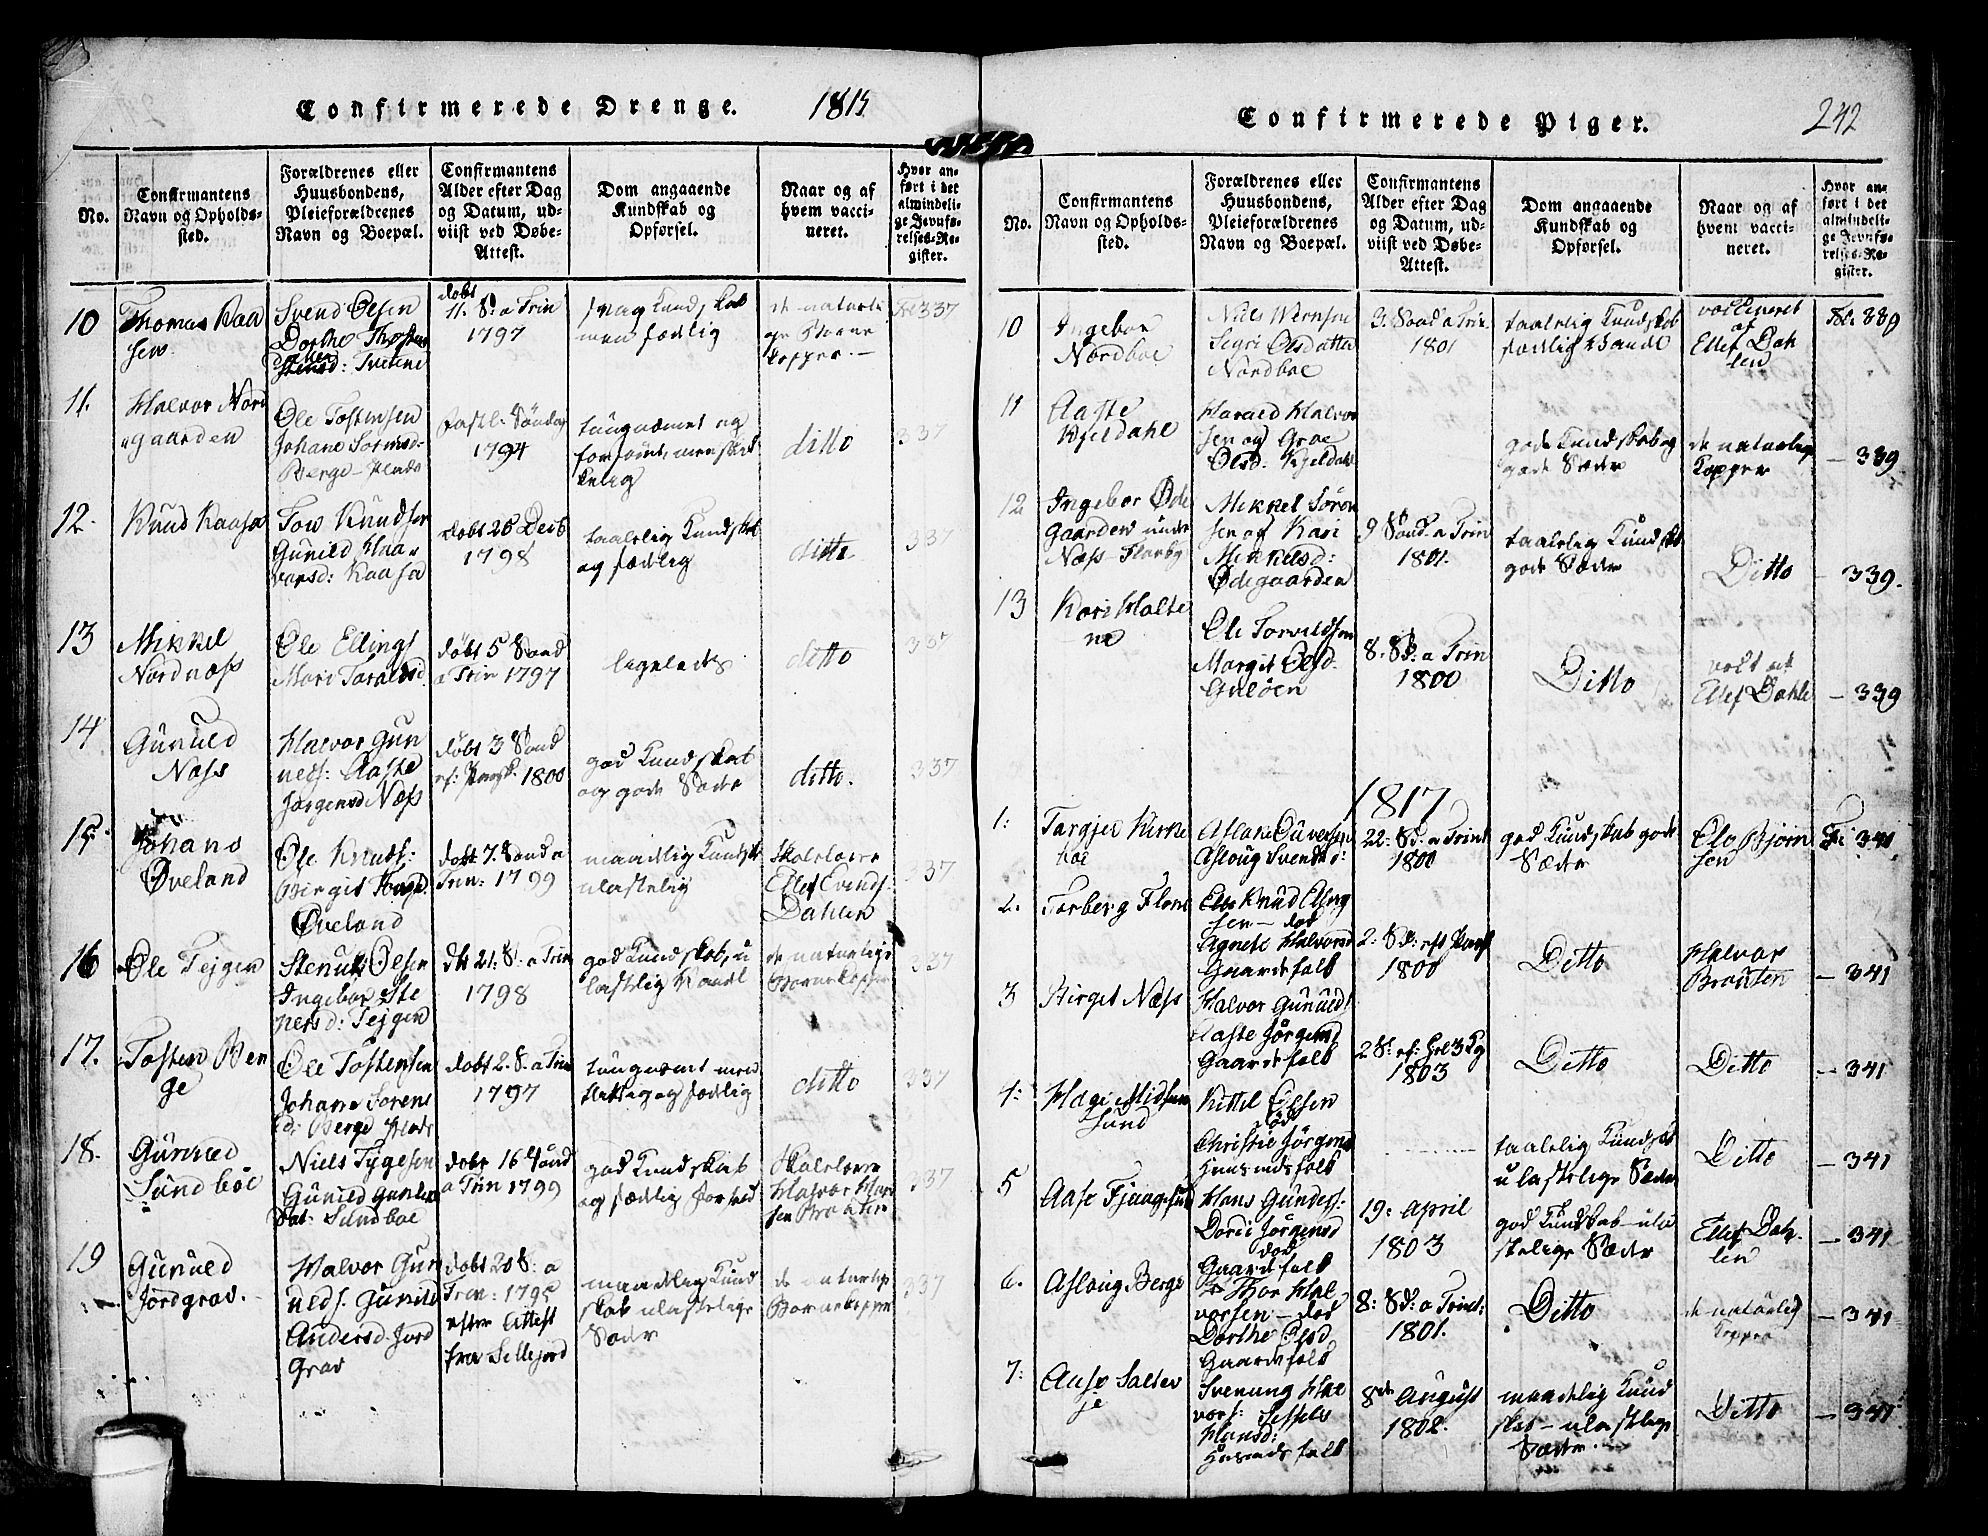 SAKO, Kviteseid kirkebøker, F/Fa/L0005: Parish register (official) no. I 5, 1815-1836, p. 242